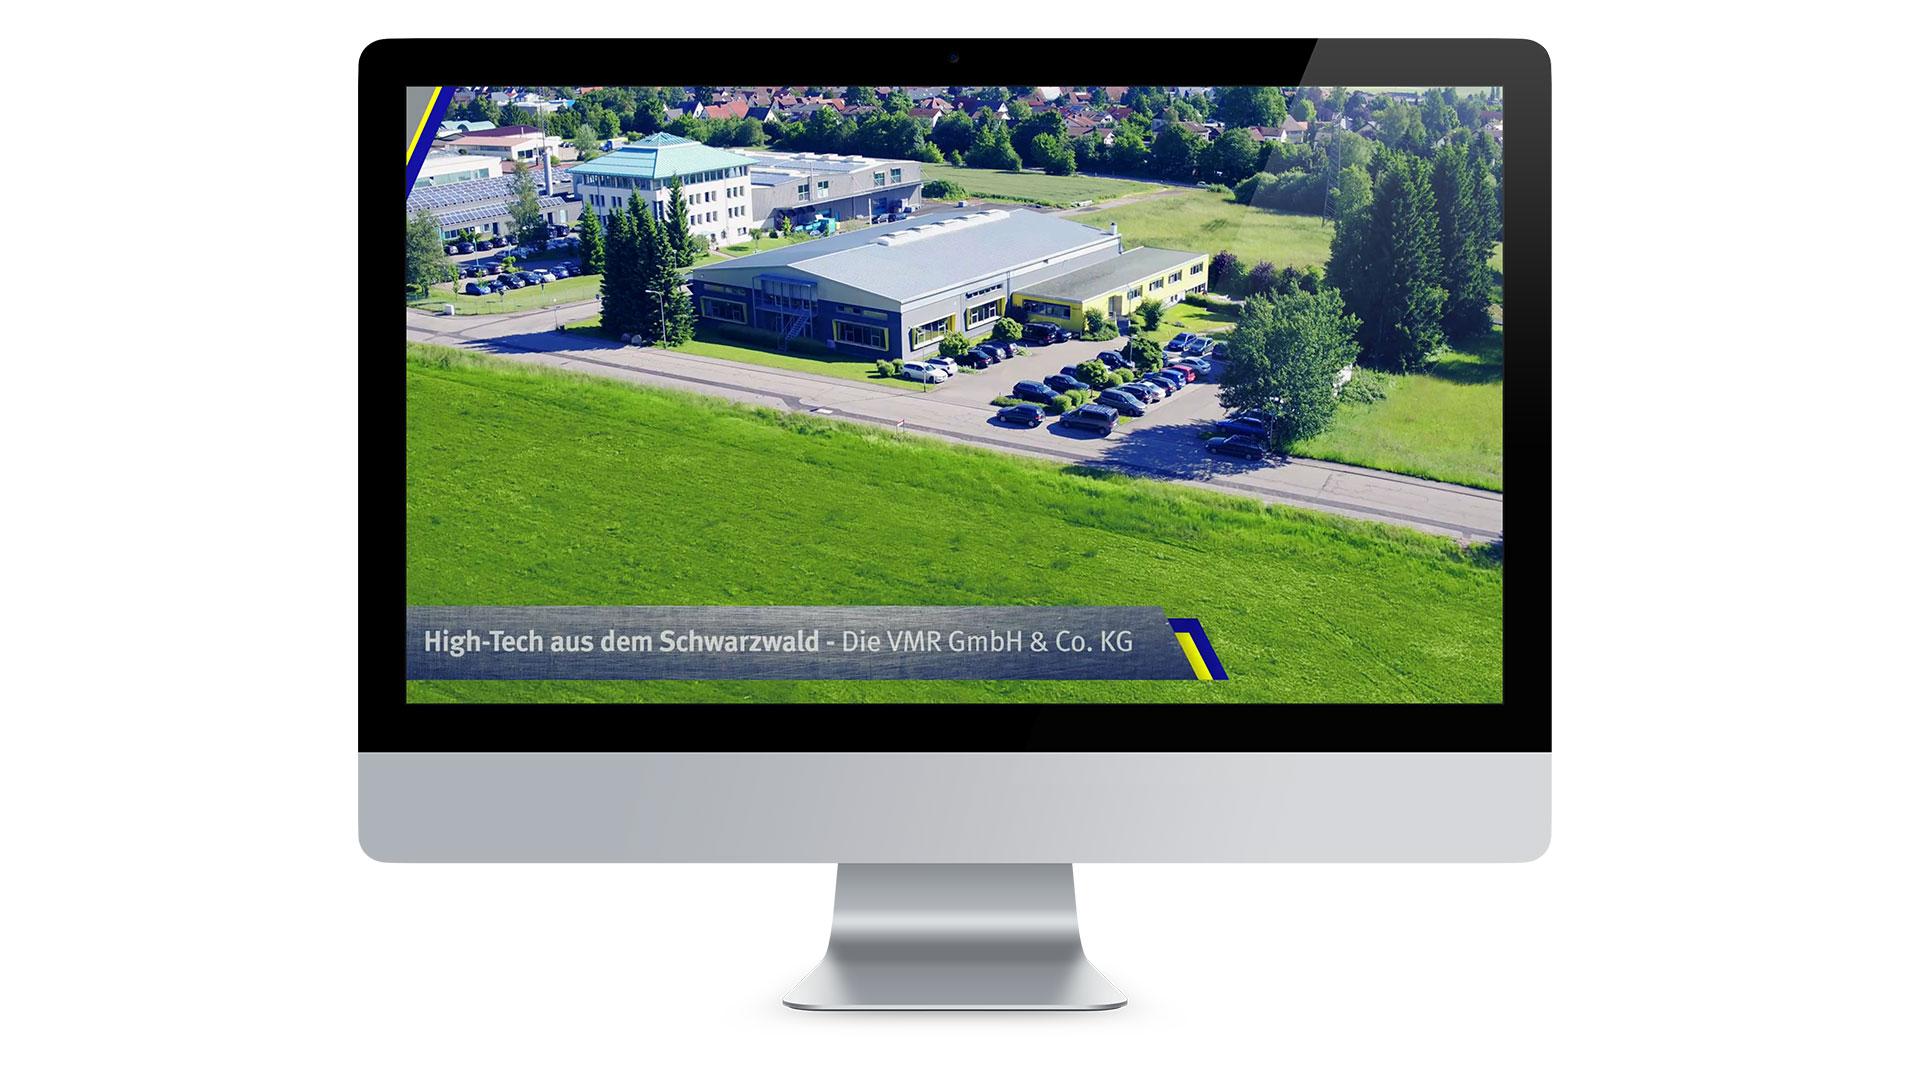 VMR GmbH & Co. KG Film